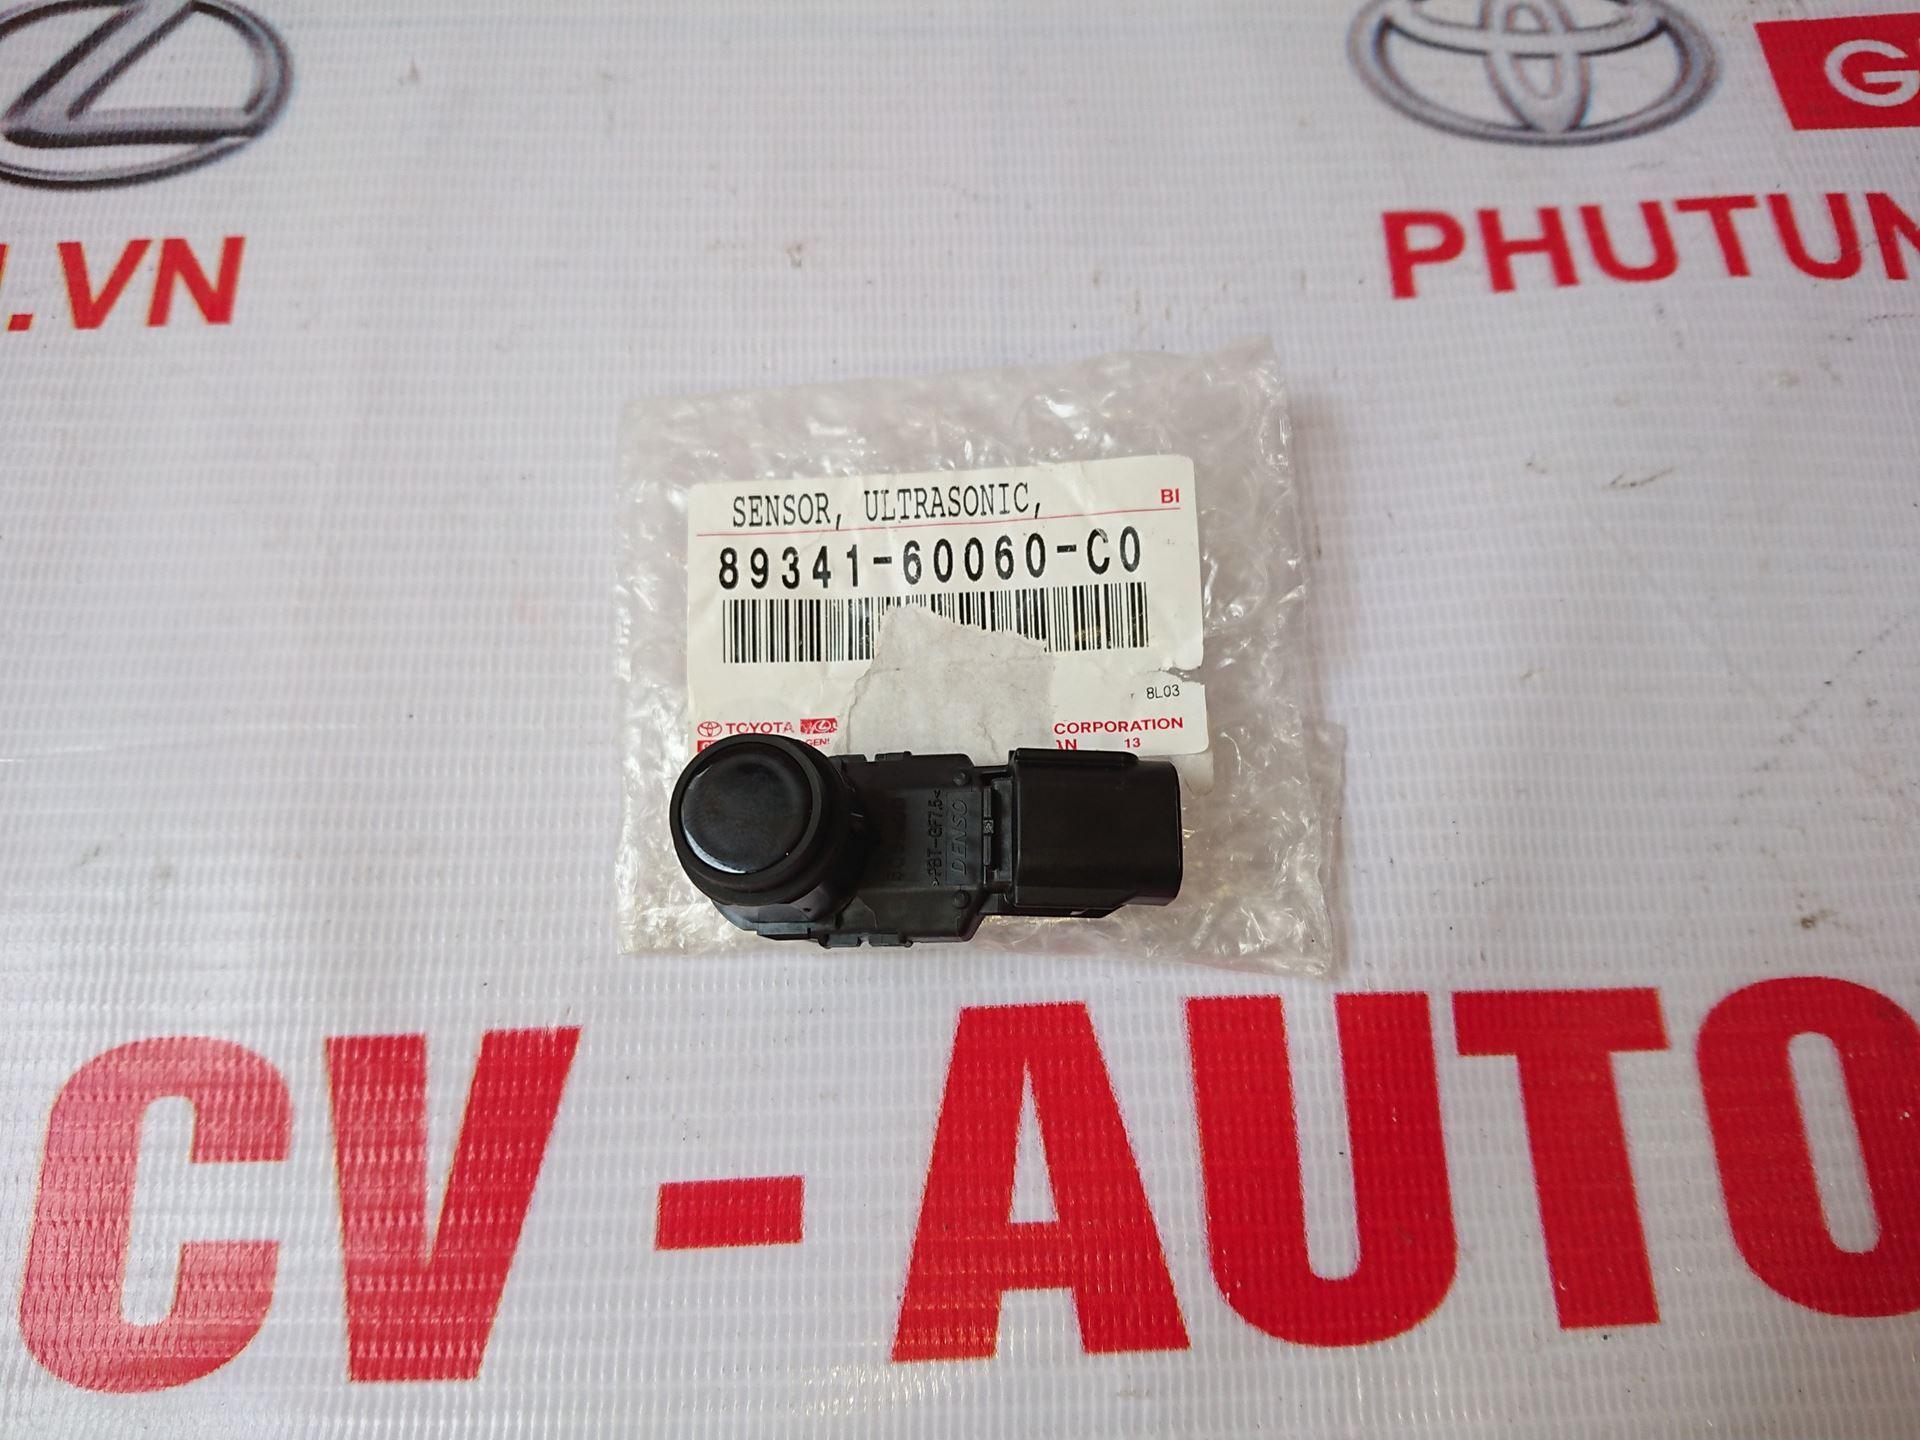 Picture of 89341-60060-C0 Cảm biến khoảng cách Lexus LX570, Land Cruiser Prado